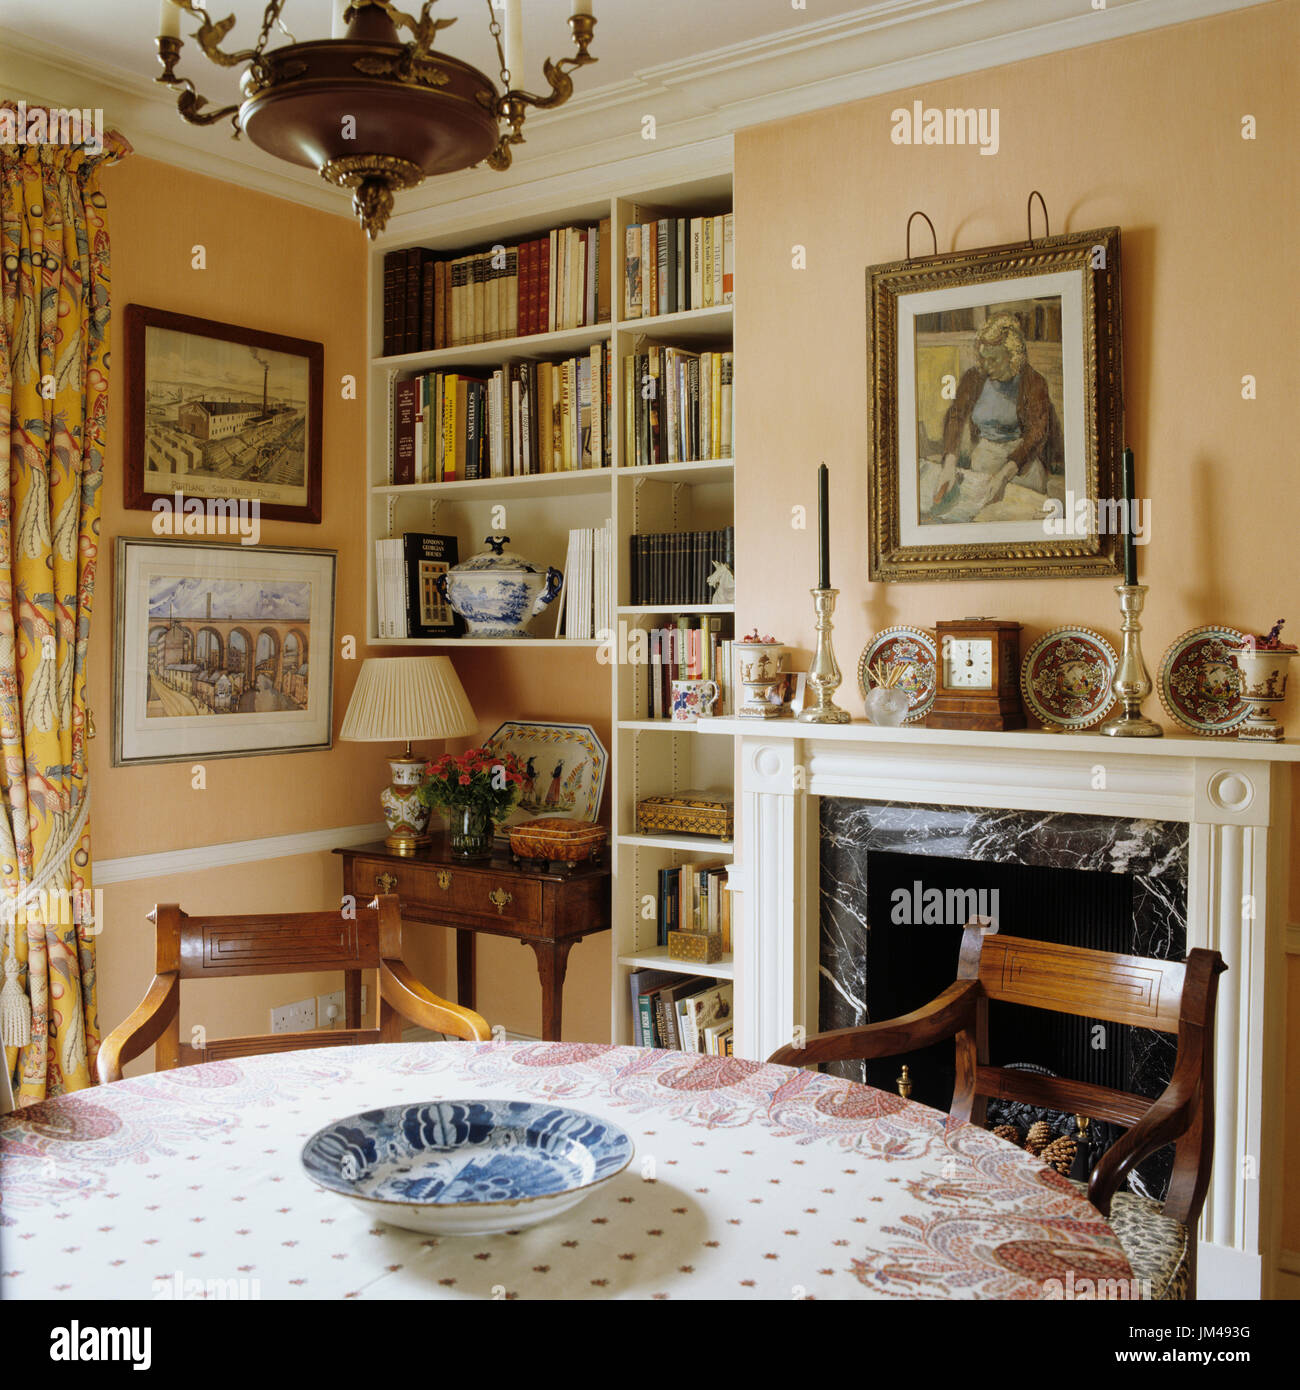 Mesa de comedor con chimenea Foto & Imagen De Stock: 150071028 - Alamy